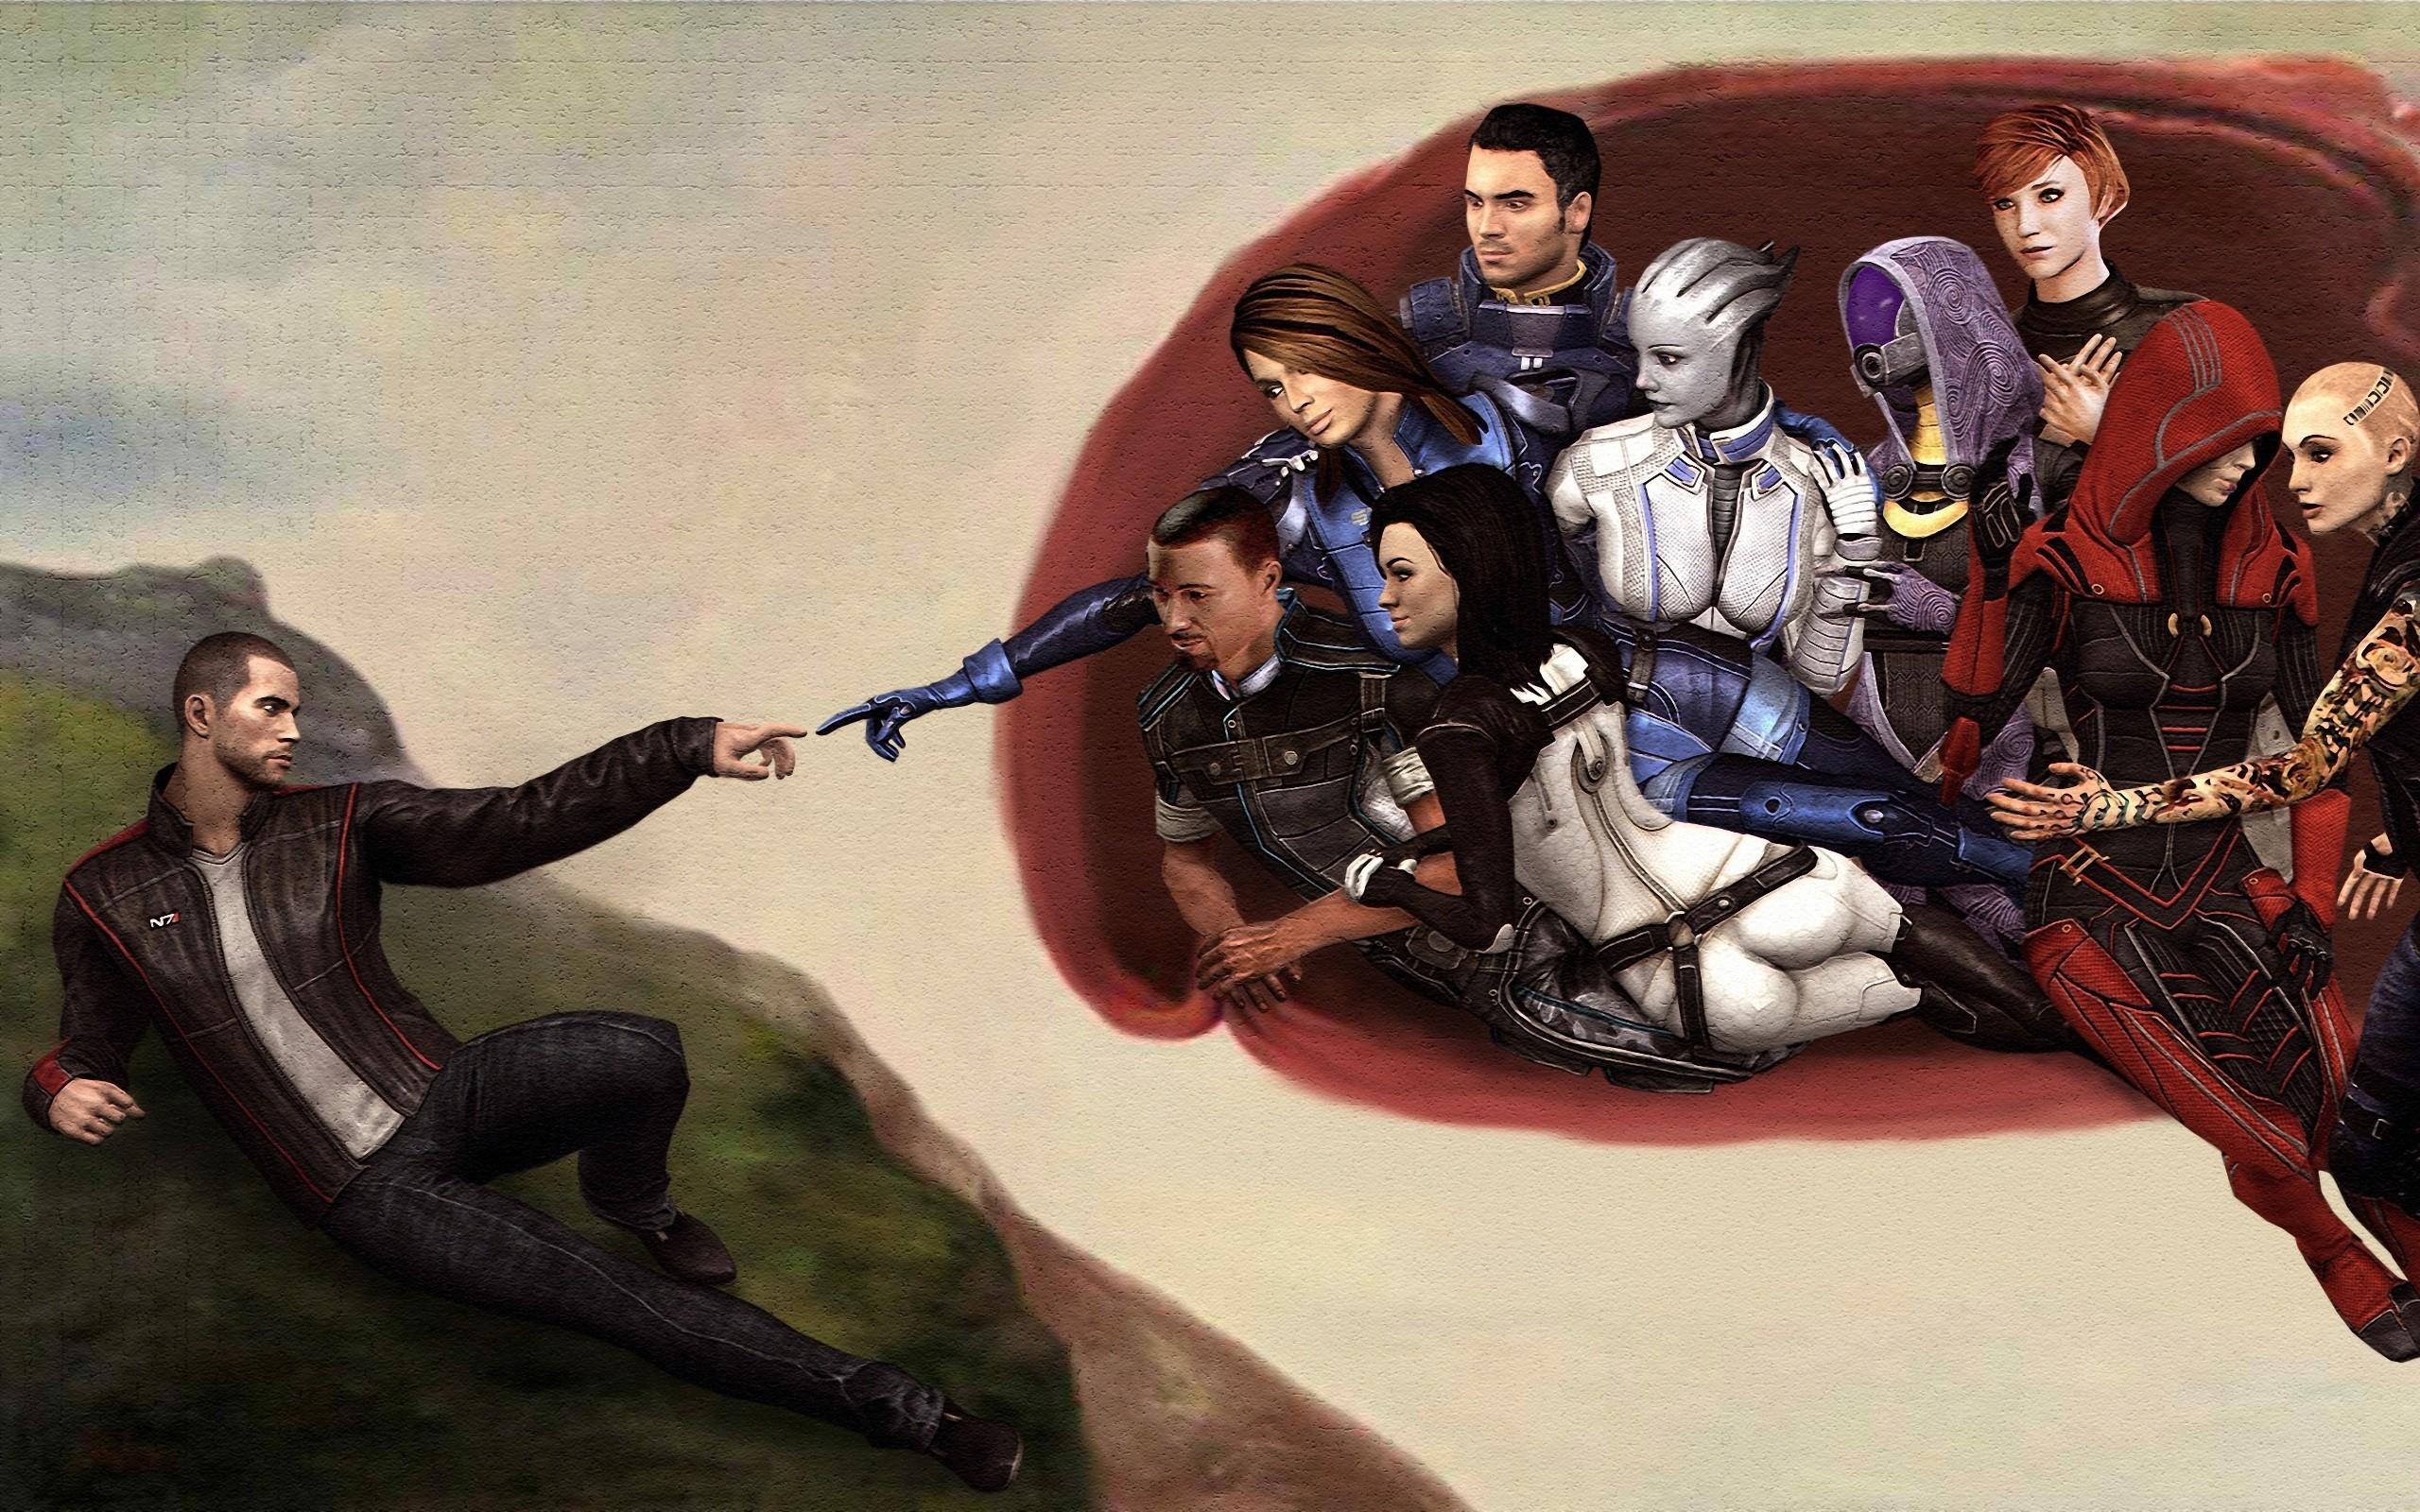 General 2560x1600 Mass Effect Mass Effect 2 Mass Effect 3 Commander Shepard Ashley Williams Miranda Lawson Kasumi Goto Jack The Creation of Adam video games Tali'Zorah video game art video game girls video game man